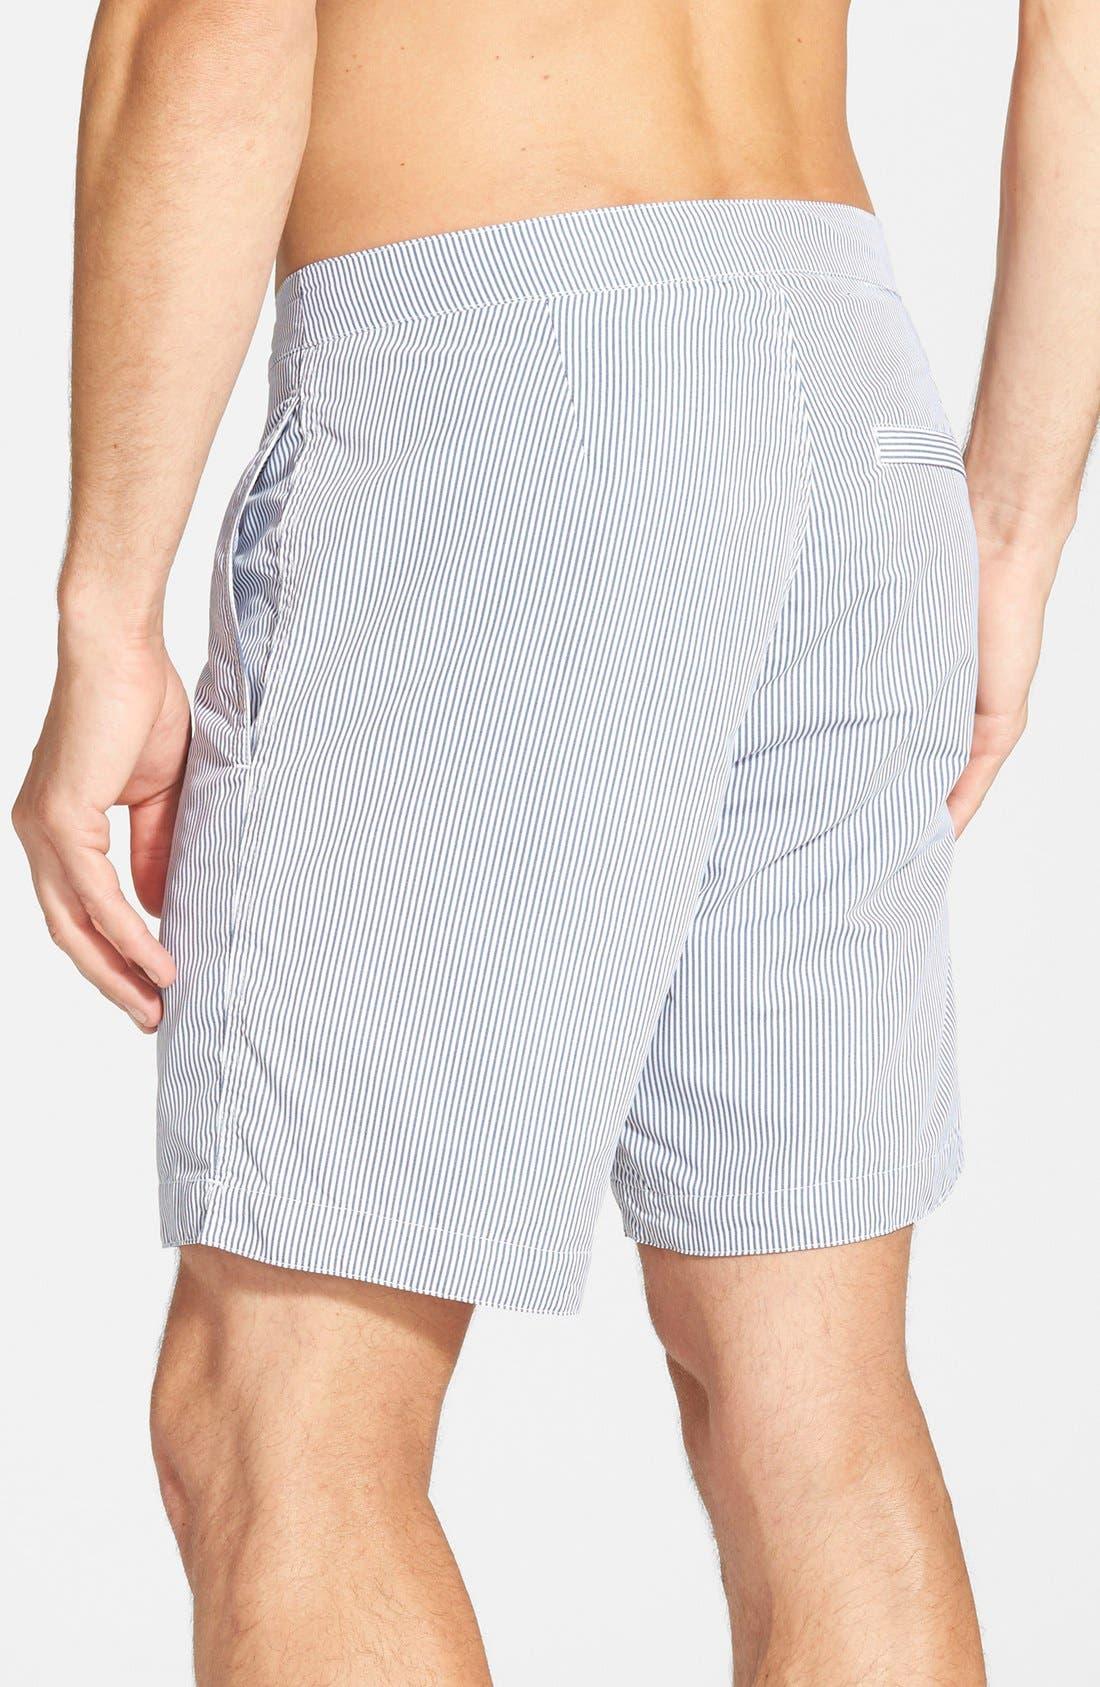 'Aruba - Stripe' Tailored Fit 8.5 Inch Board Shorts,                             Alternate thumbnail 2, color,                             STRIPED ANCHOR GREY